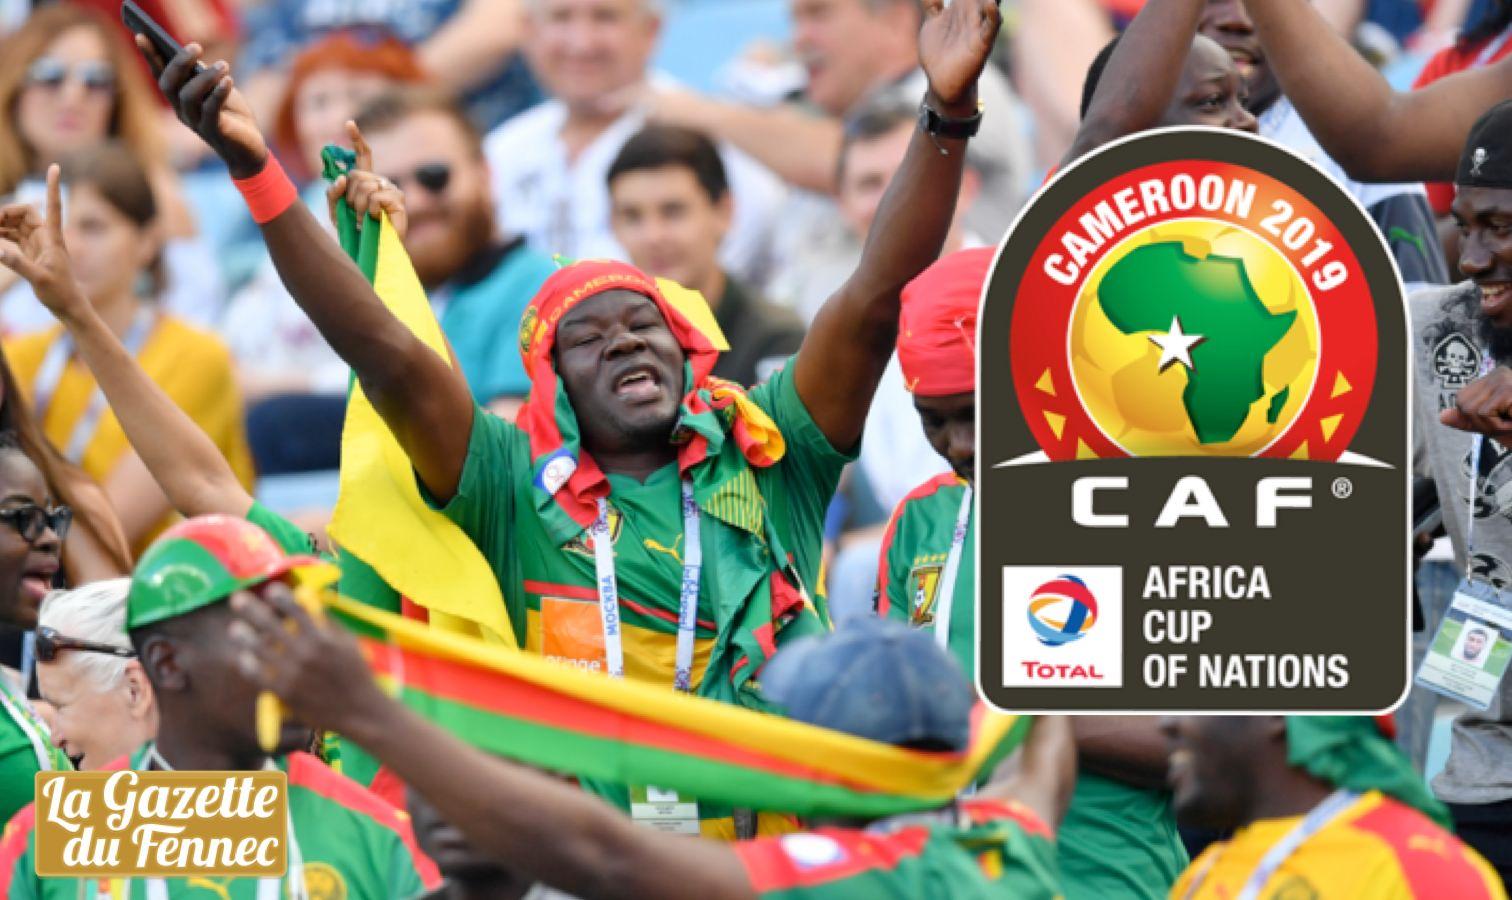 cameroun CAN 2019 supporter